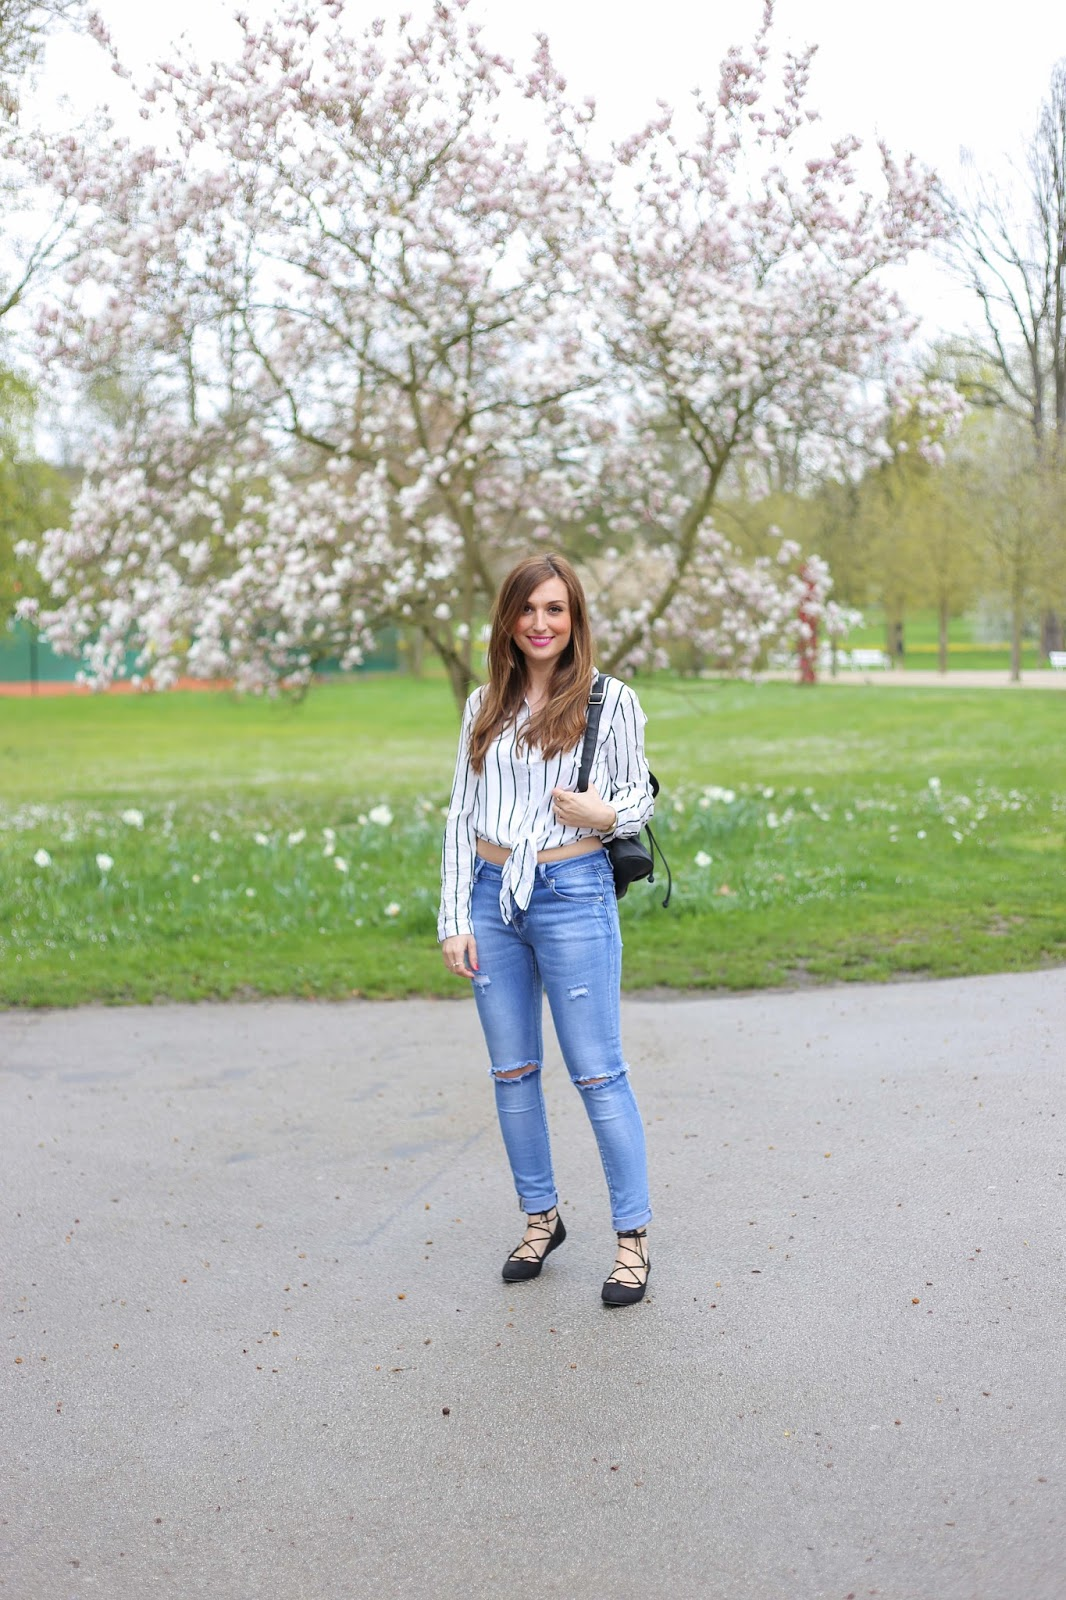 Rucksack- Outfitinspiration - Fashionblogger aus Deutschland - Deutsche Fashionblogger - Fashionstylebyjohanna